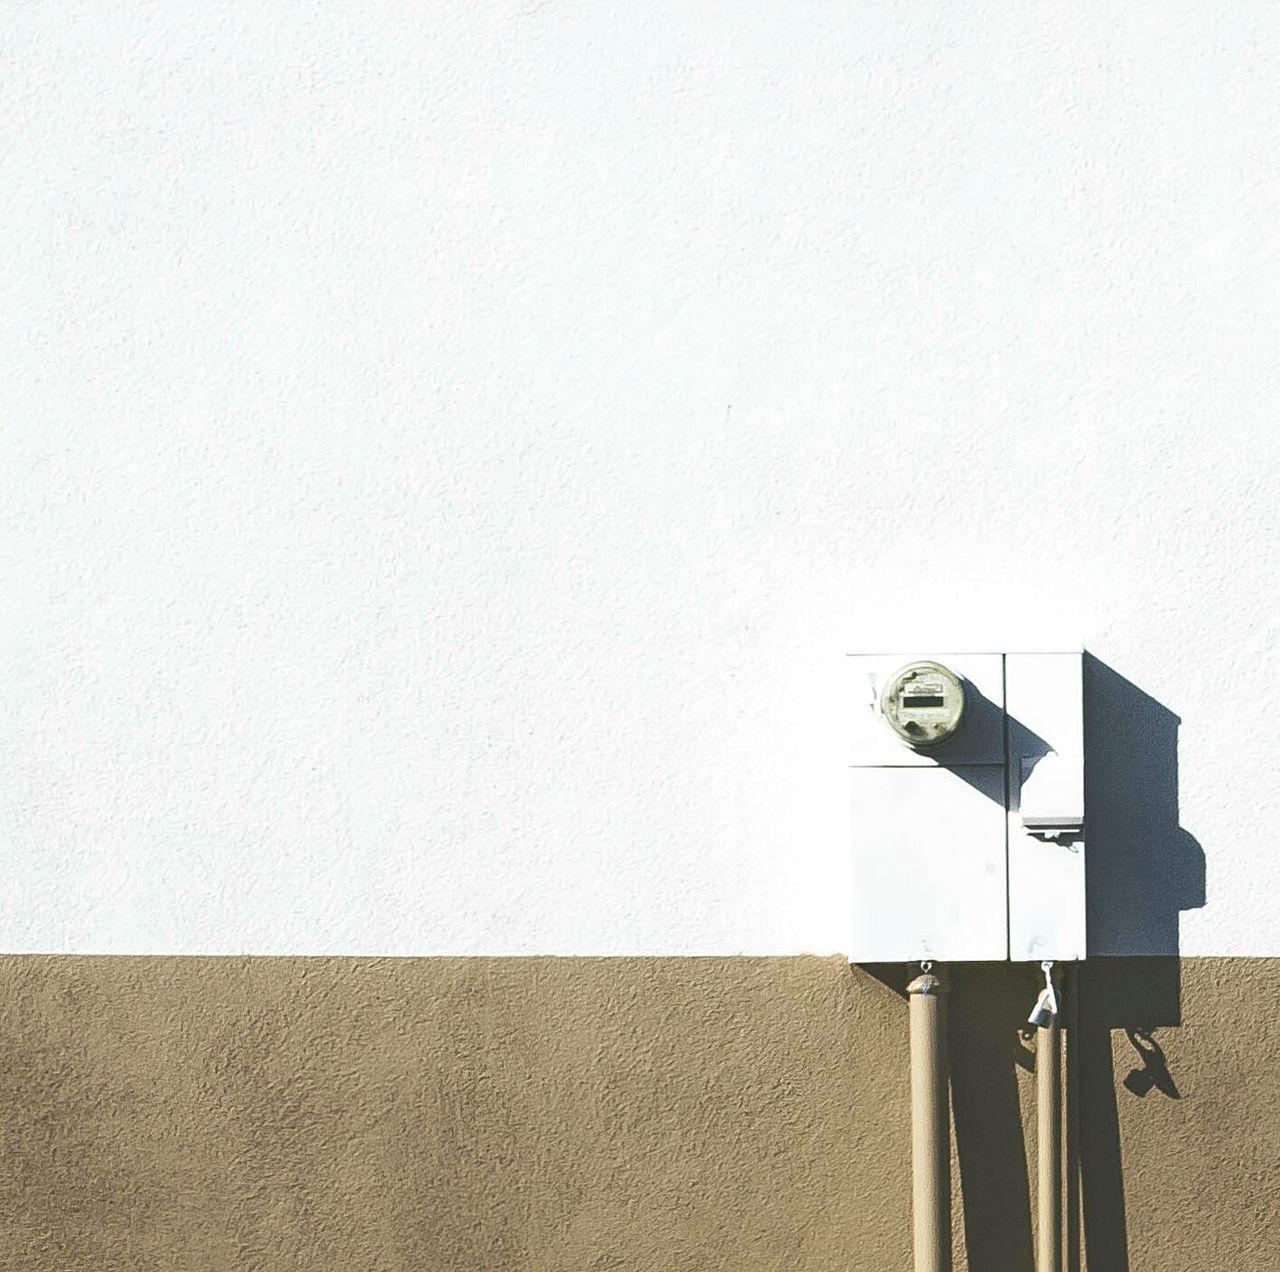 2PM IN WEST SACRAMENTO! No People Day Outdoors Close-up Minimal Minimalism Minimalobsession Minimalist Photography  Minimalist Photography  The Great Outdoors - 2017 EyeEm Awards City Backgrounds Sacramento, California California Sky